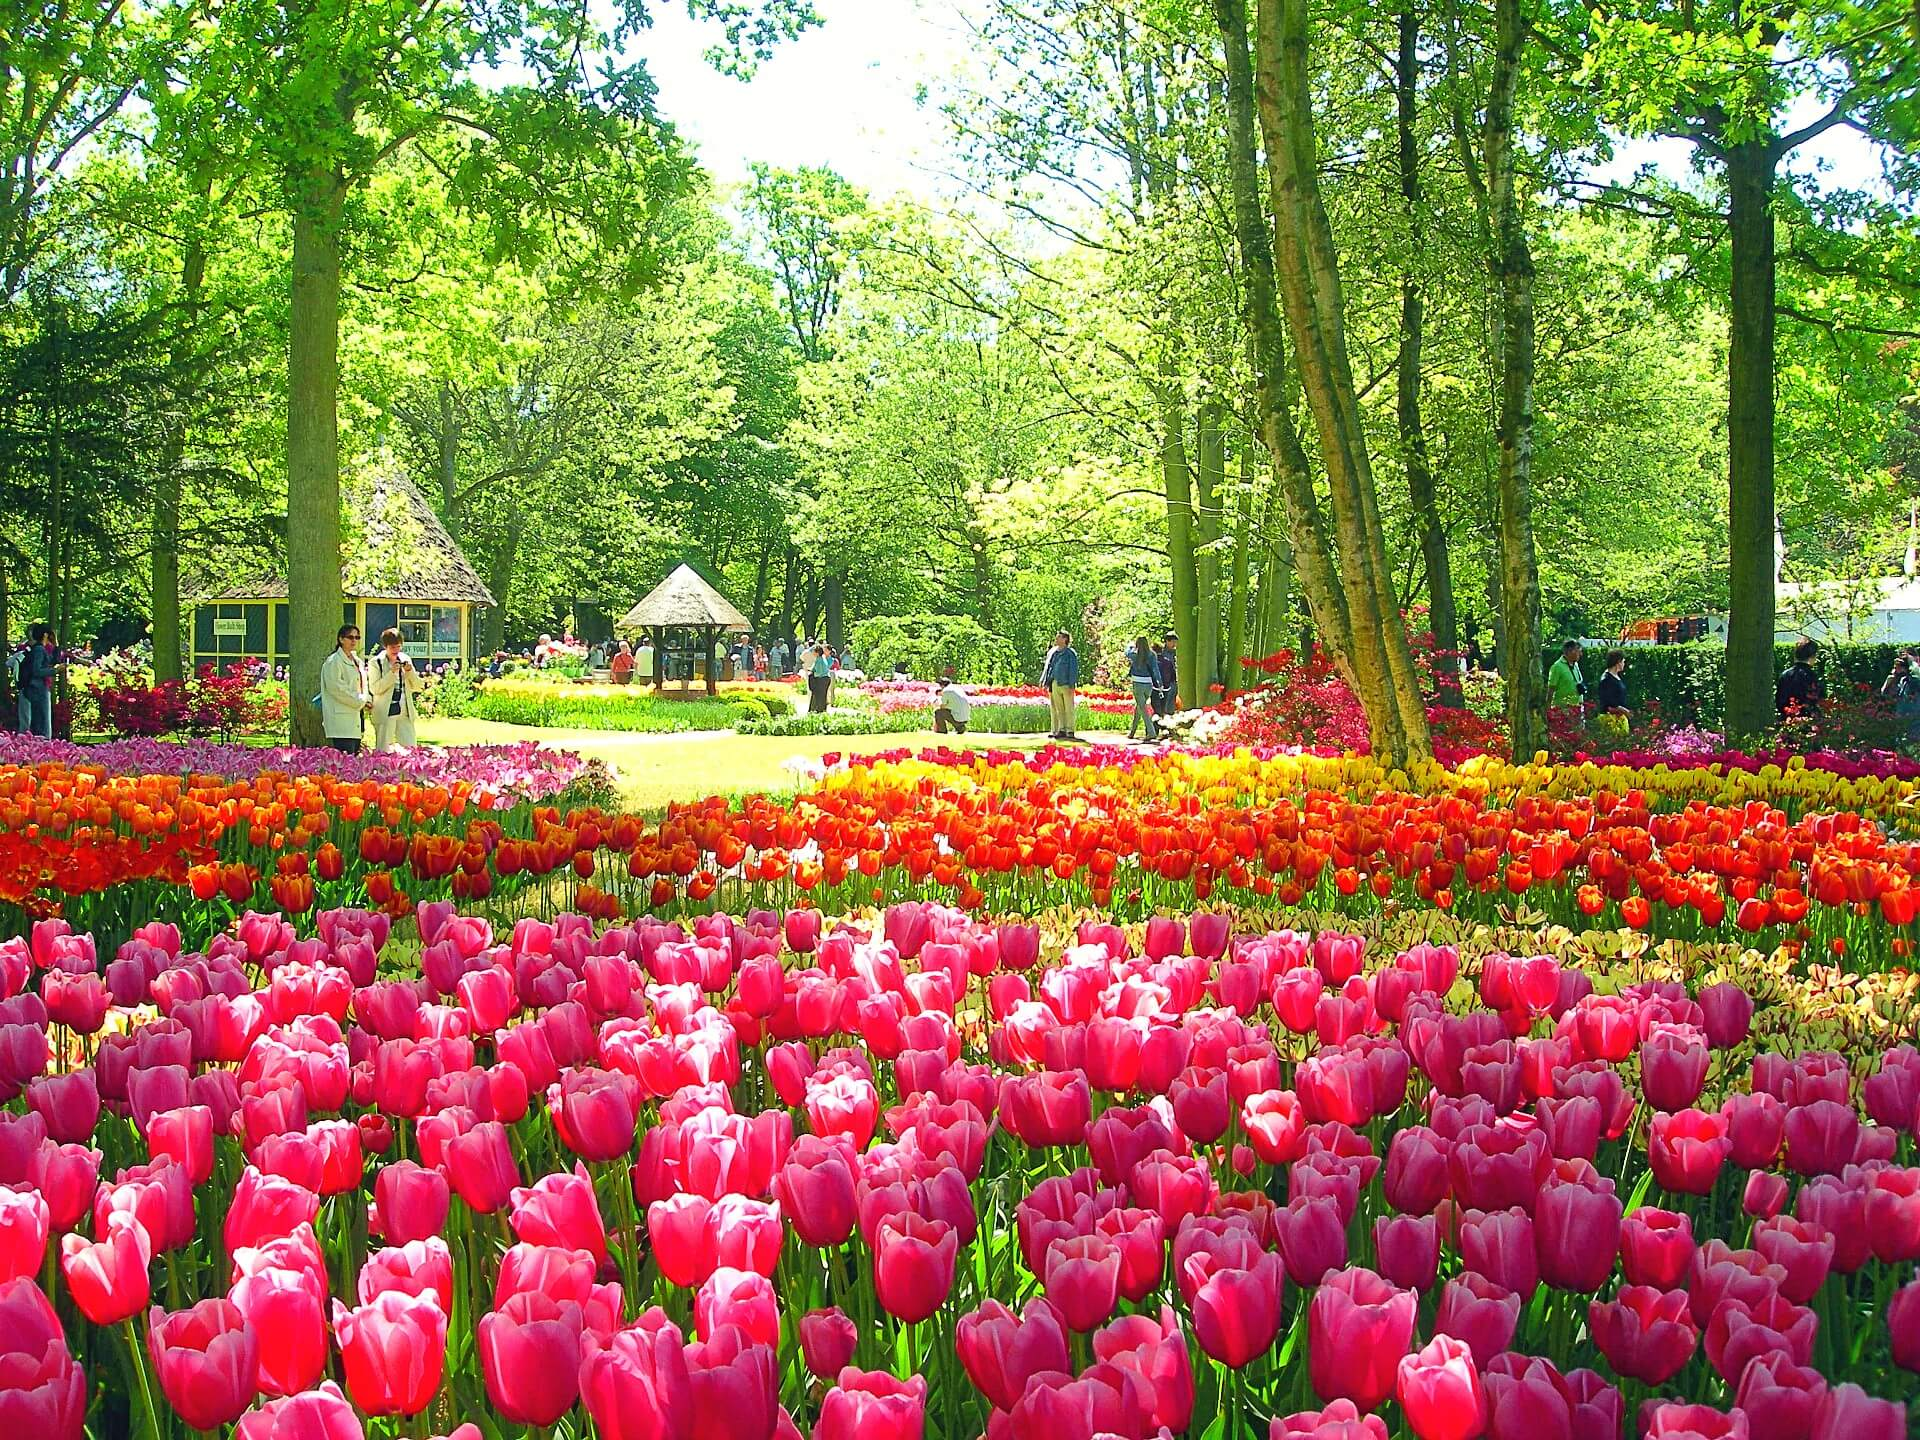 Info Shymkent - A carpet of Tulips in the Keukenhof, Netherlands